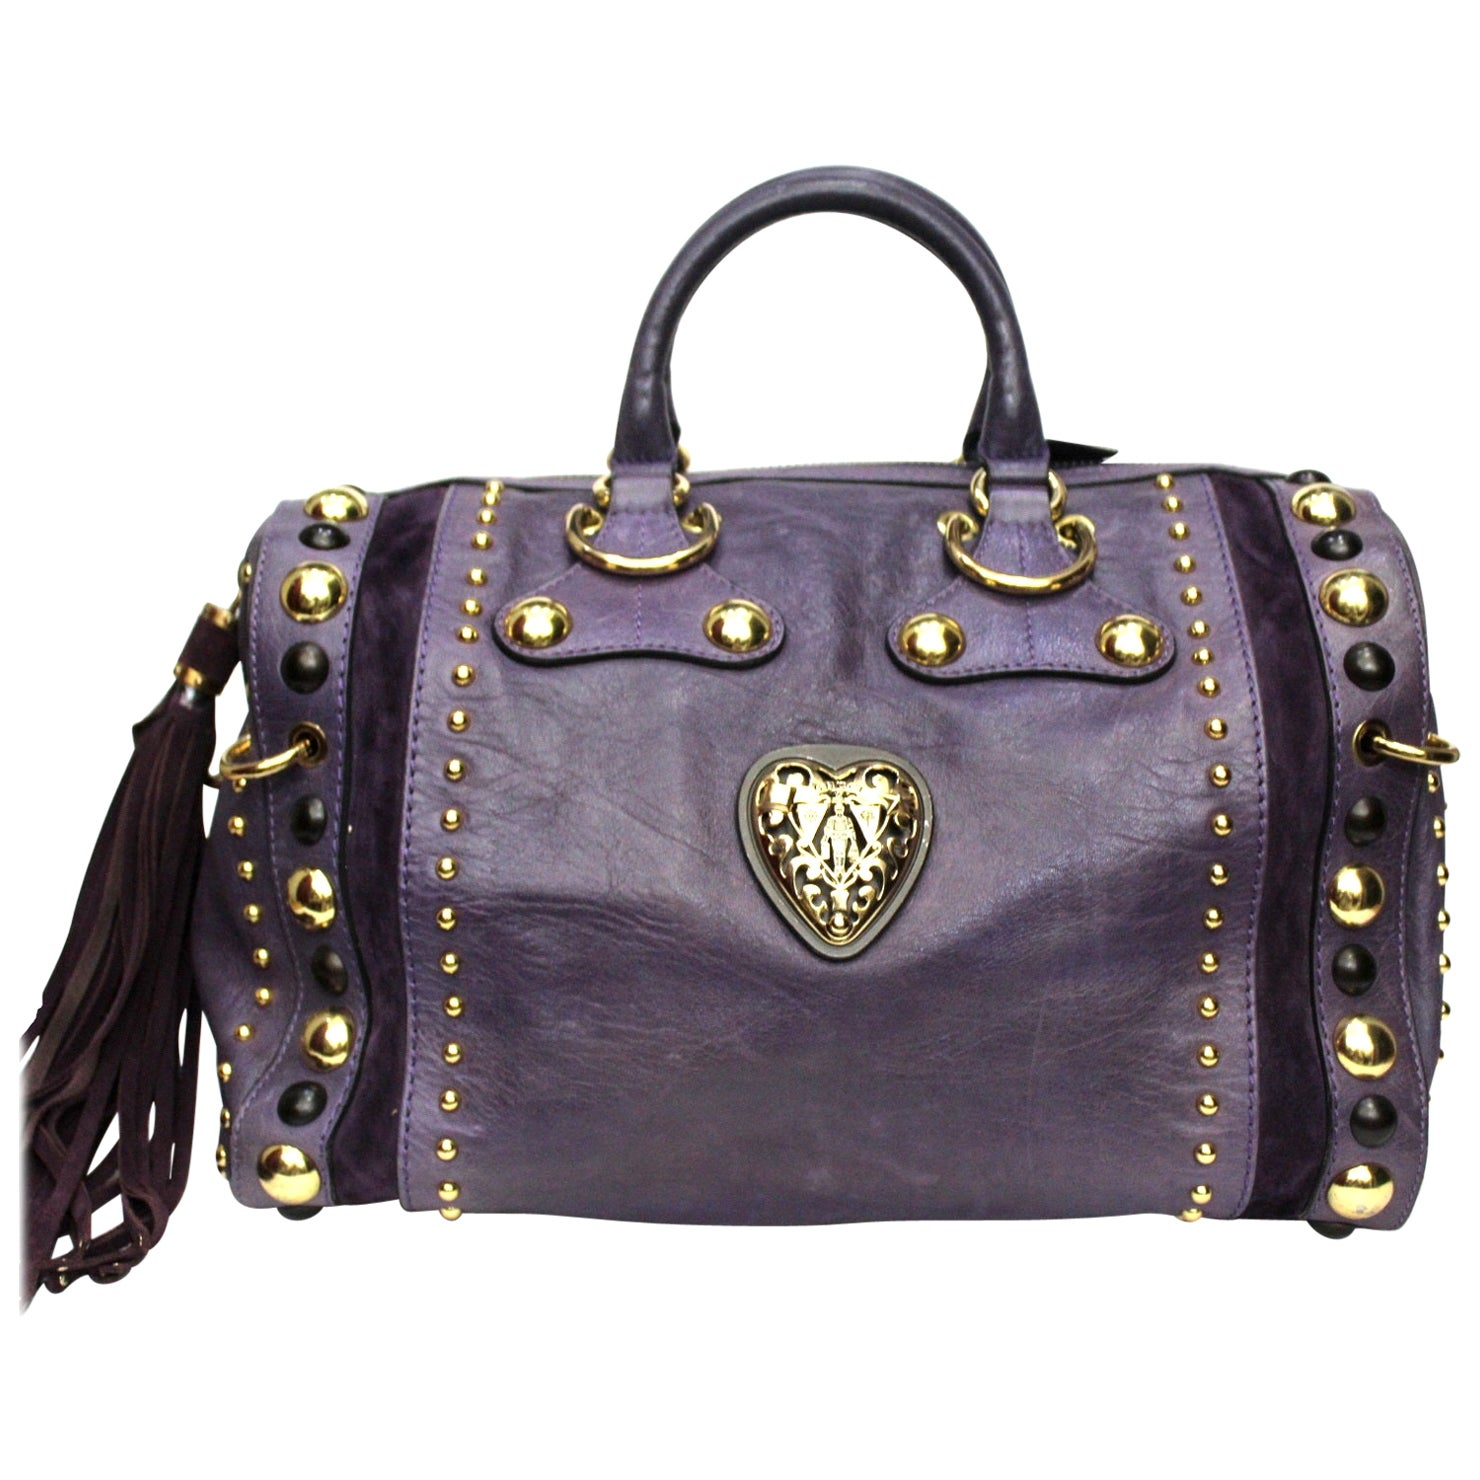 Gucci Purple Leather Babouska Boston Bag